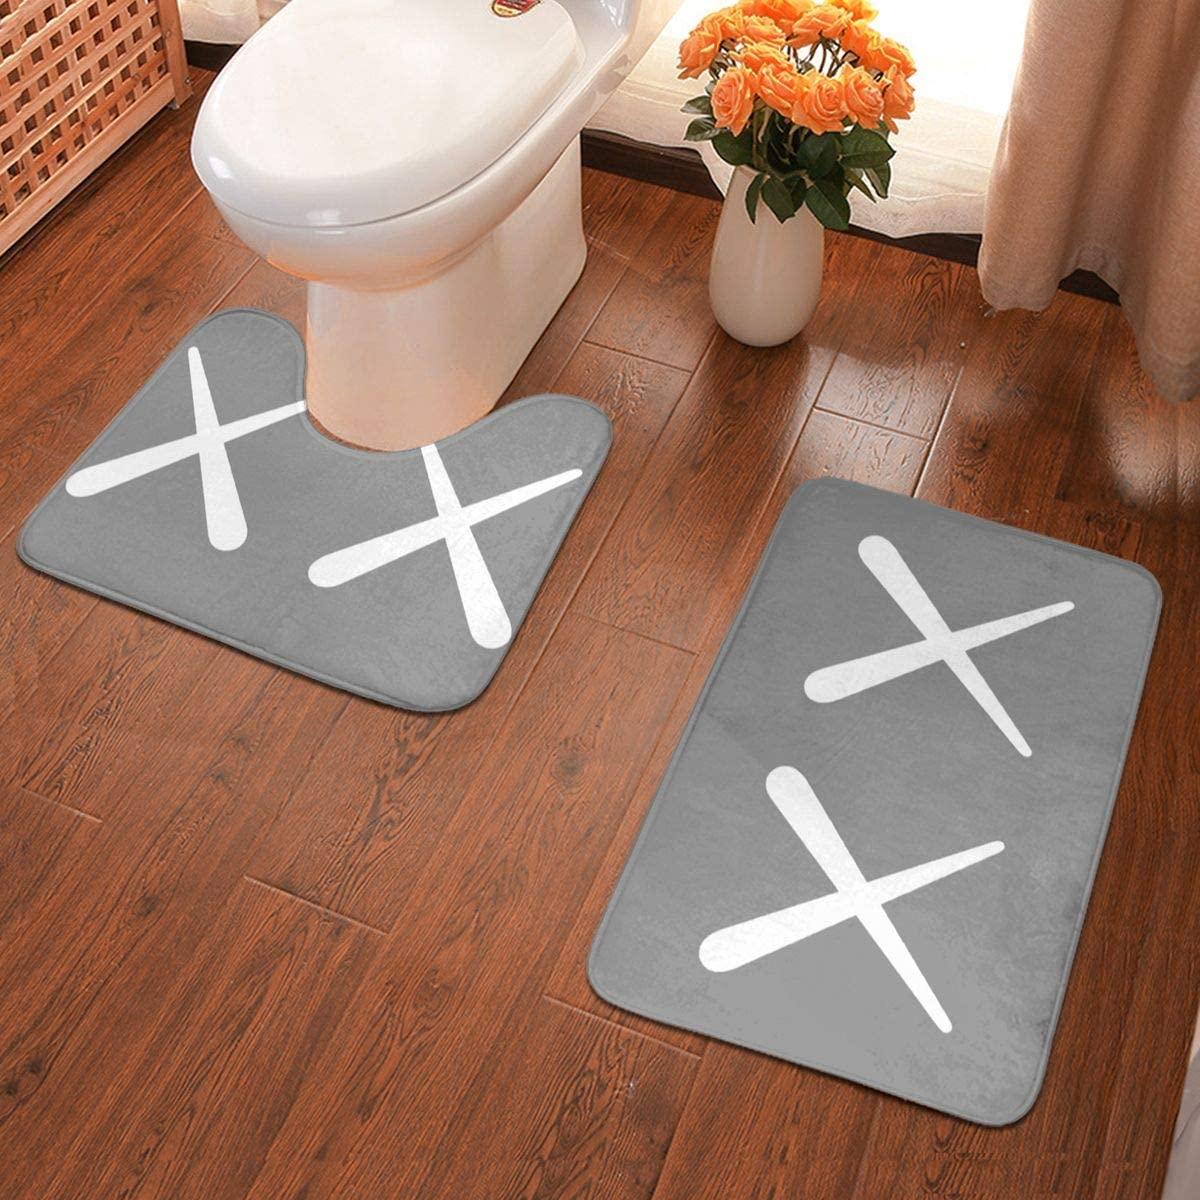 KAWS Bathroom Antiskid Pad Non-Slip Bath Carpet Floor Mat Rug 2 Sets -Floor Mat+U-Shaped Pad, Toilet Washable Blanket Mats for Bathroom Home Shower